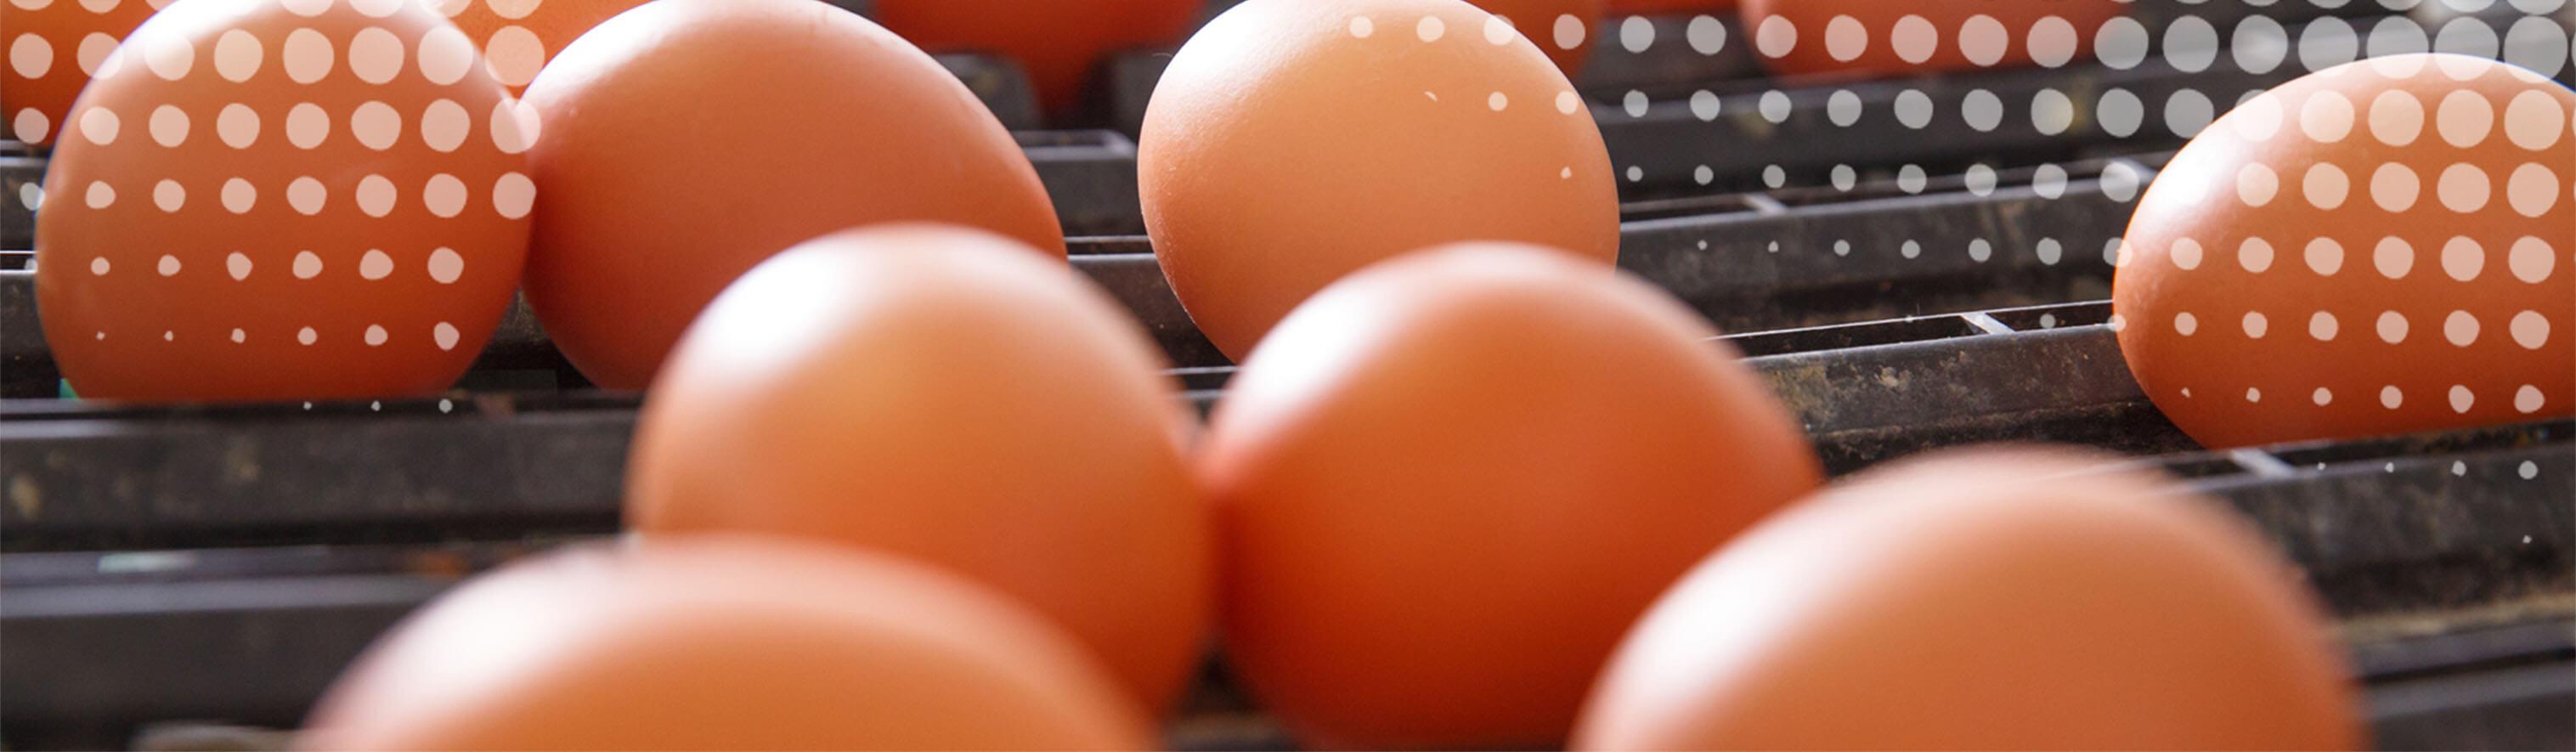 Food Safety Testing Slider - Brown Eggs on Conveyor